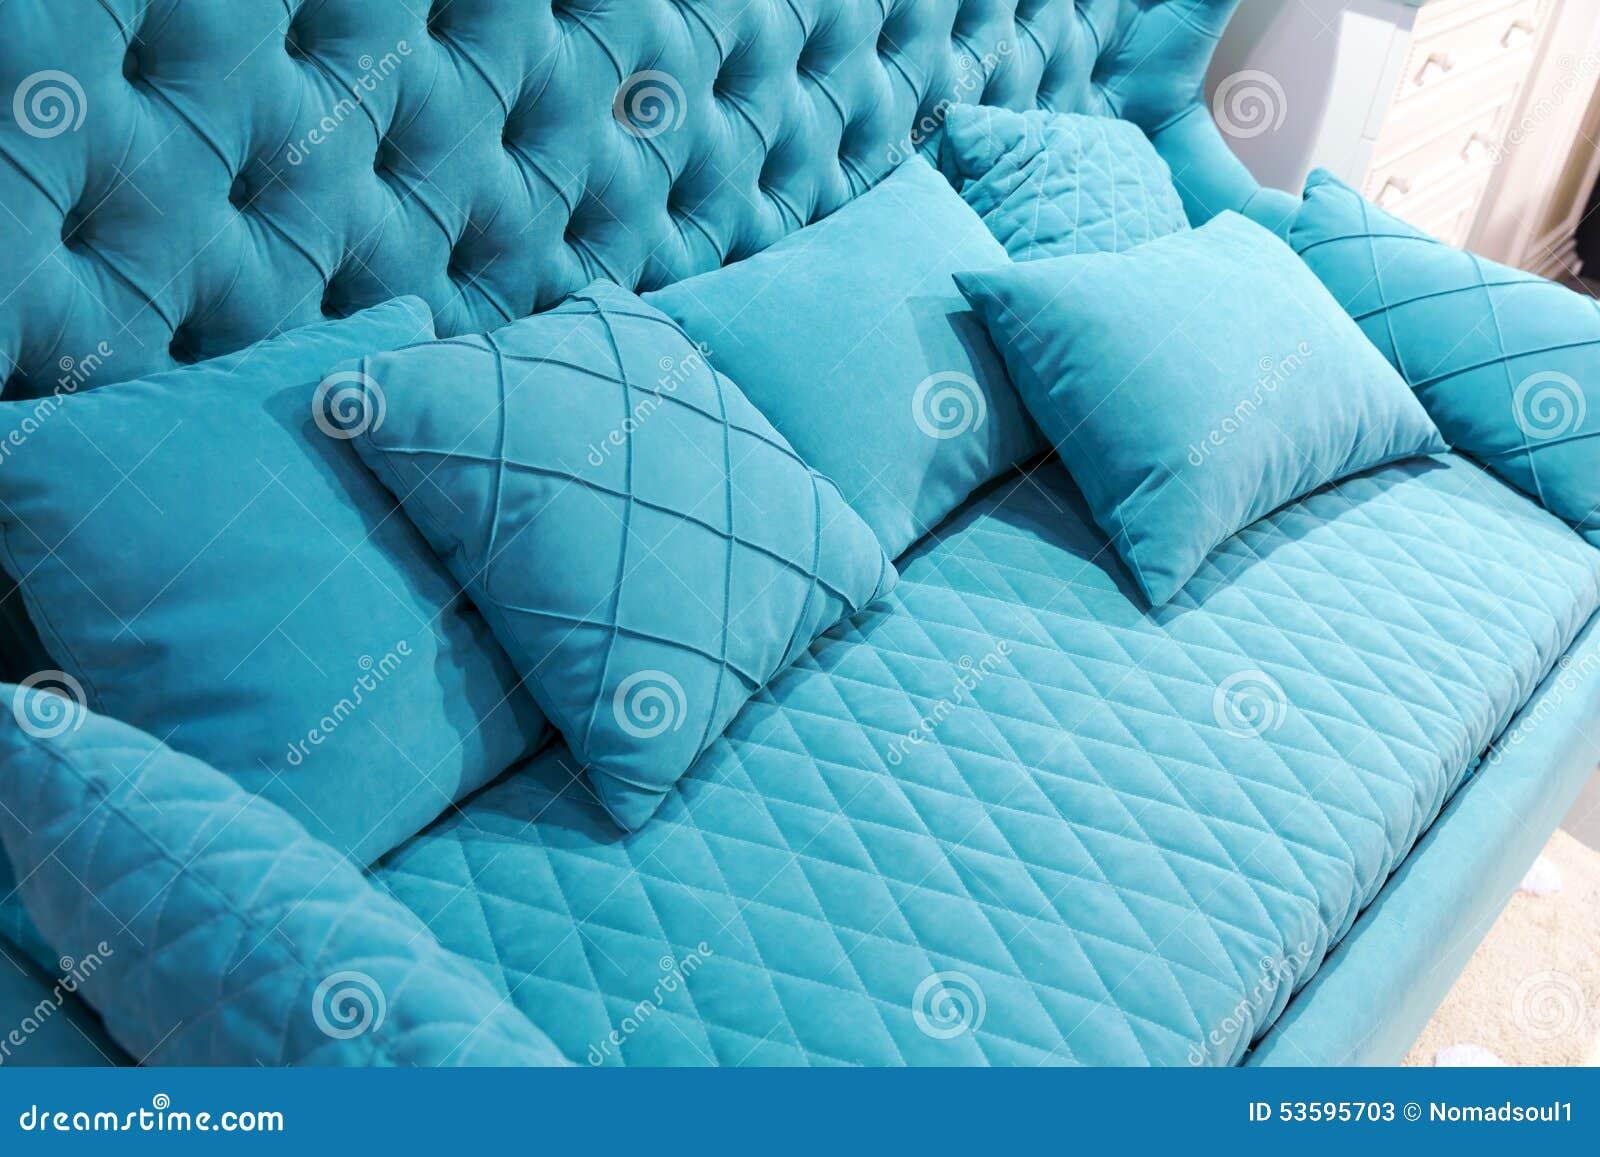 Download Blaues Sofa Stockbild. Bild Von Möbel, Haupt, Stuhl, Lebensstil    53595703